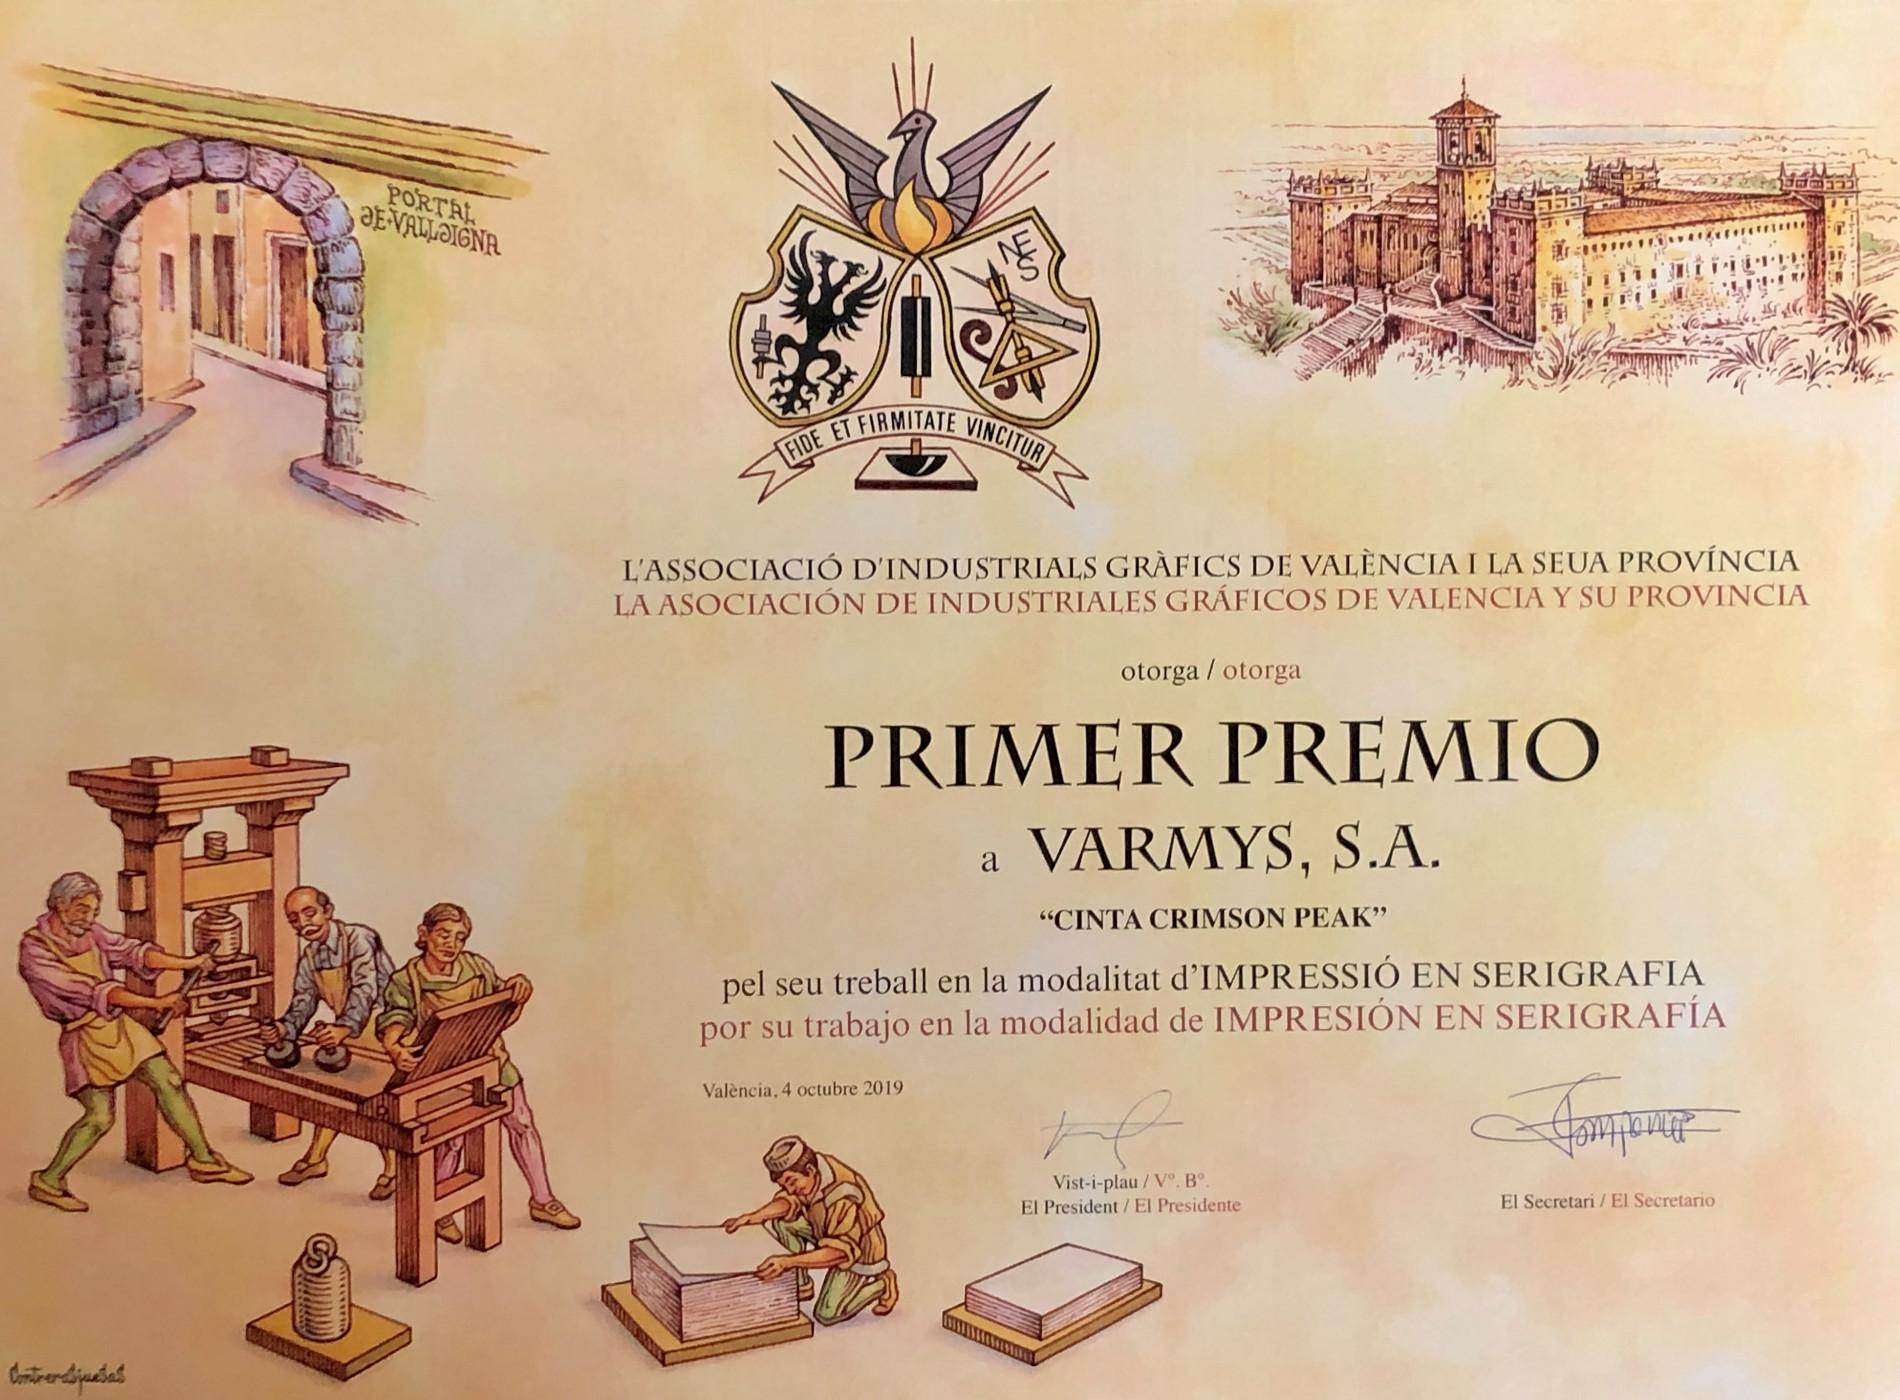 Primer premio serigrafía Varmys